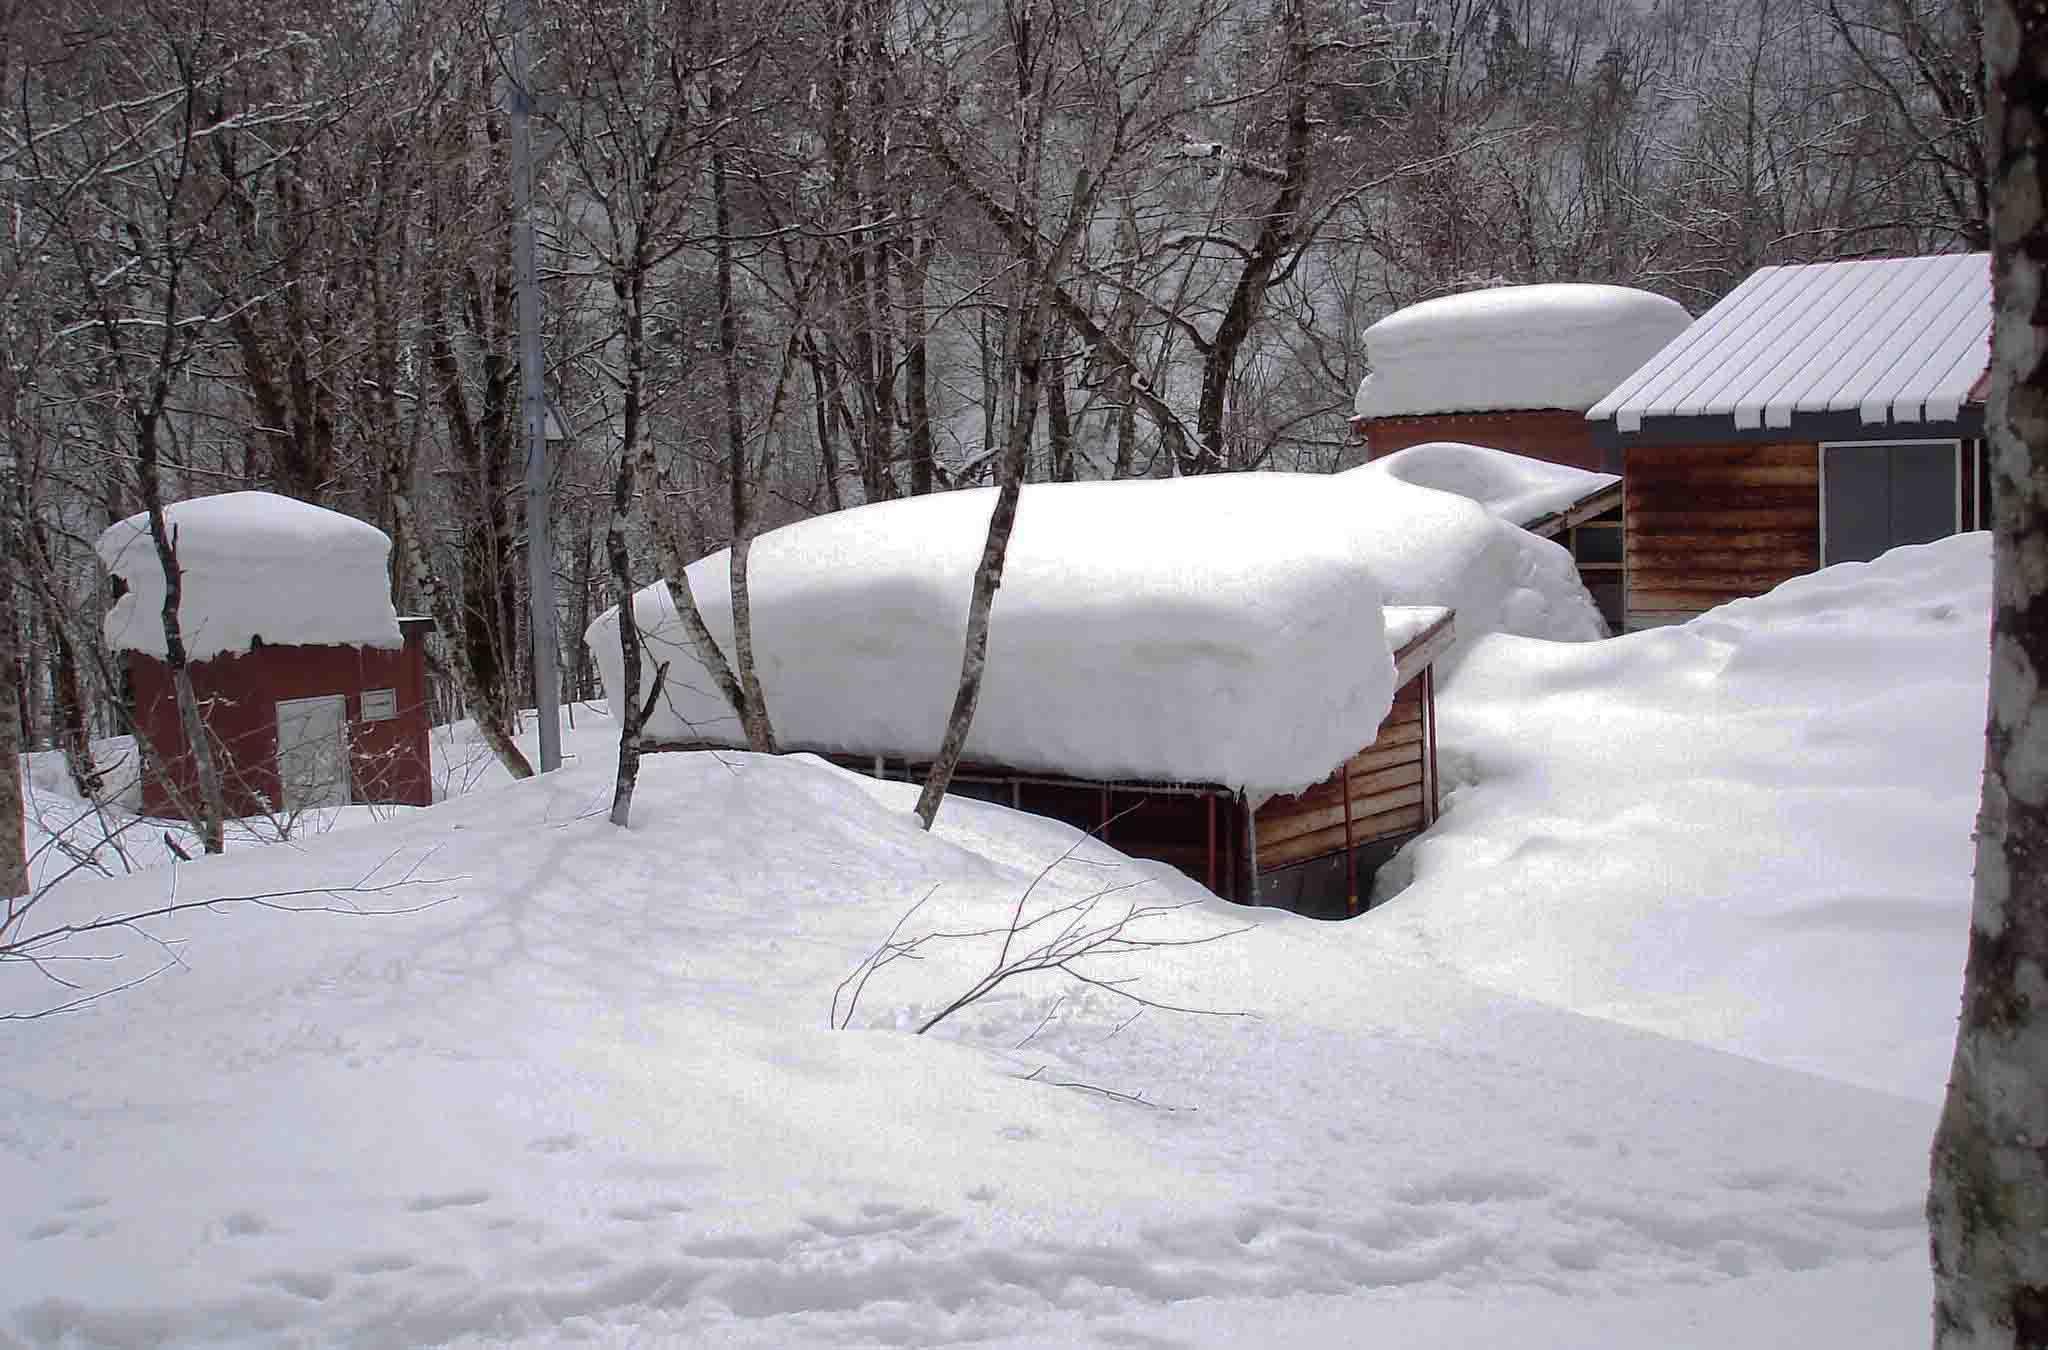 DSC09064 ワサビ小屋周辺の残雪